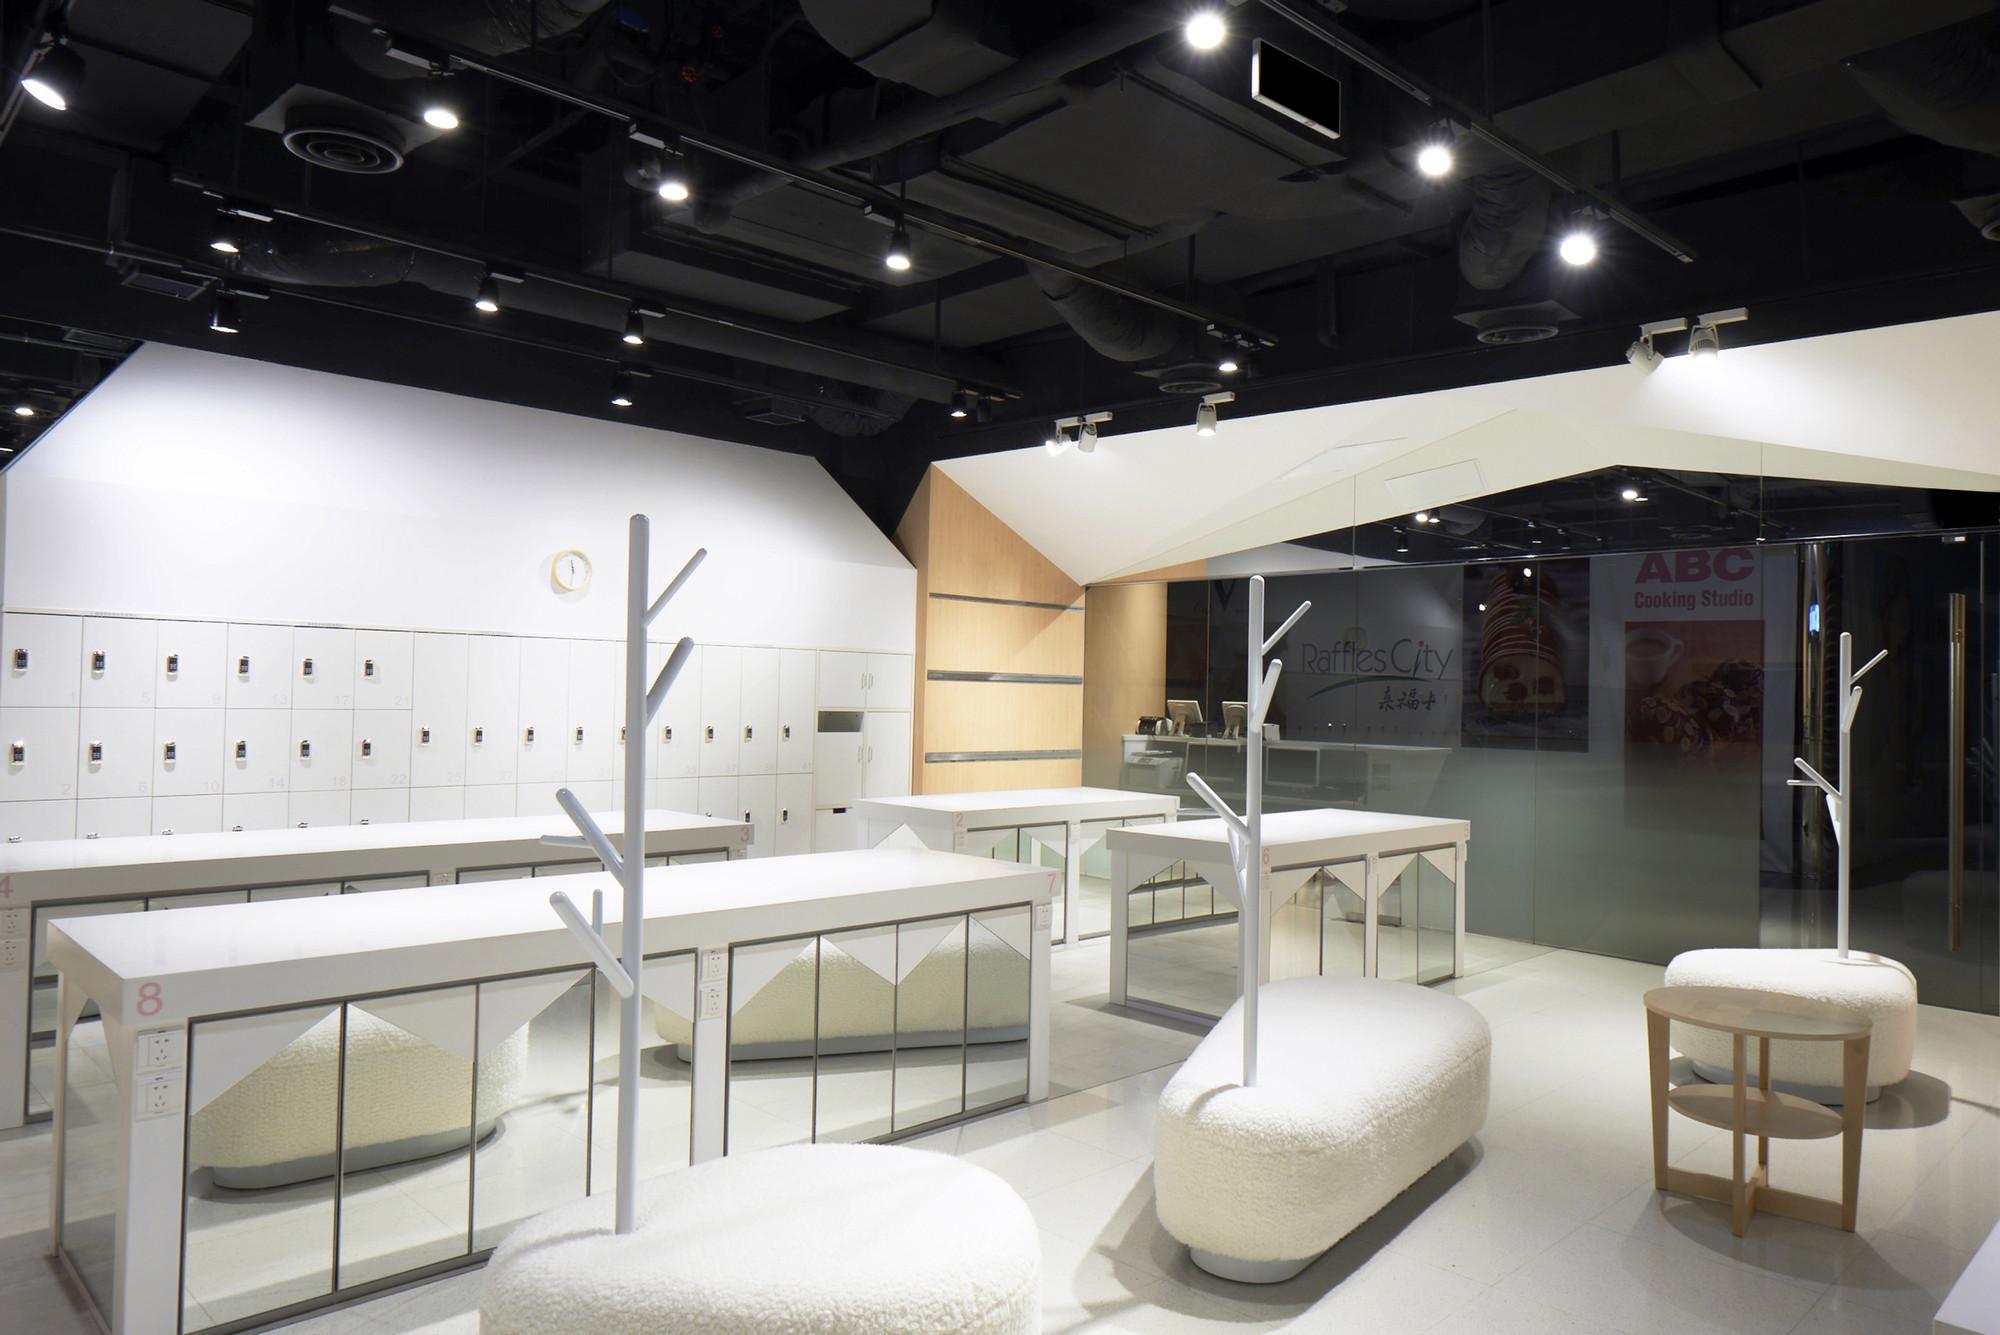 Gallery of ABC Cooking Studio / Prism Design - 10